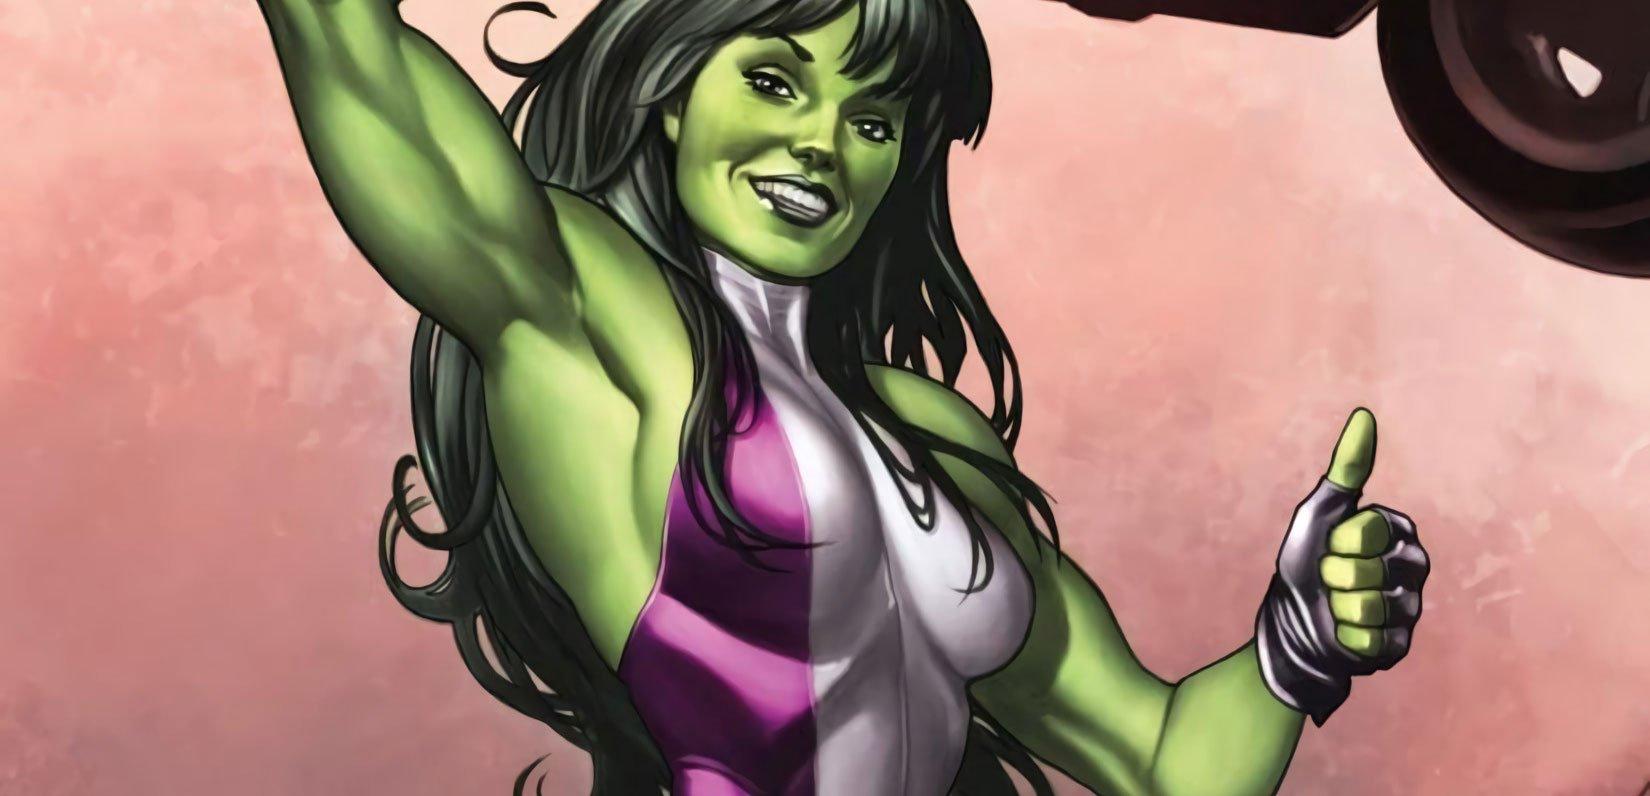 Галк / Hulk